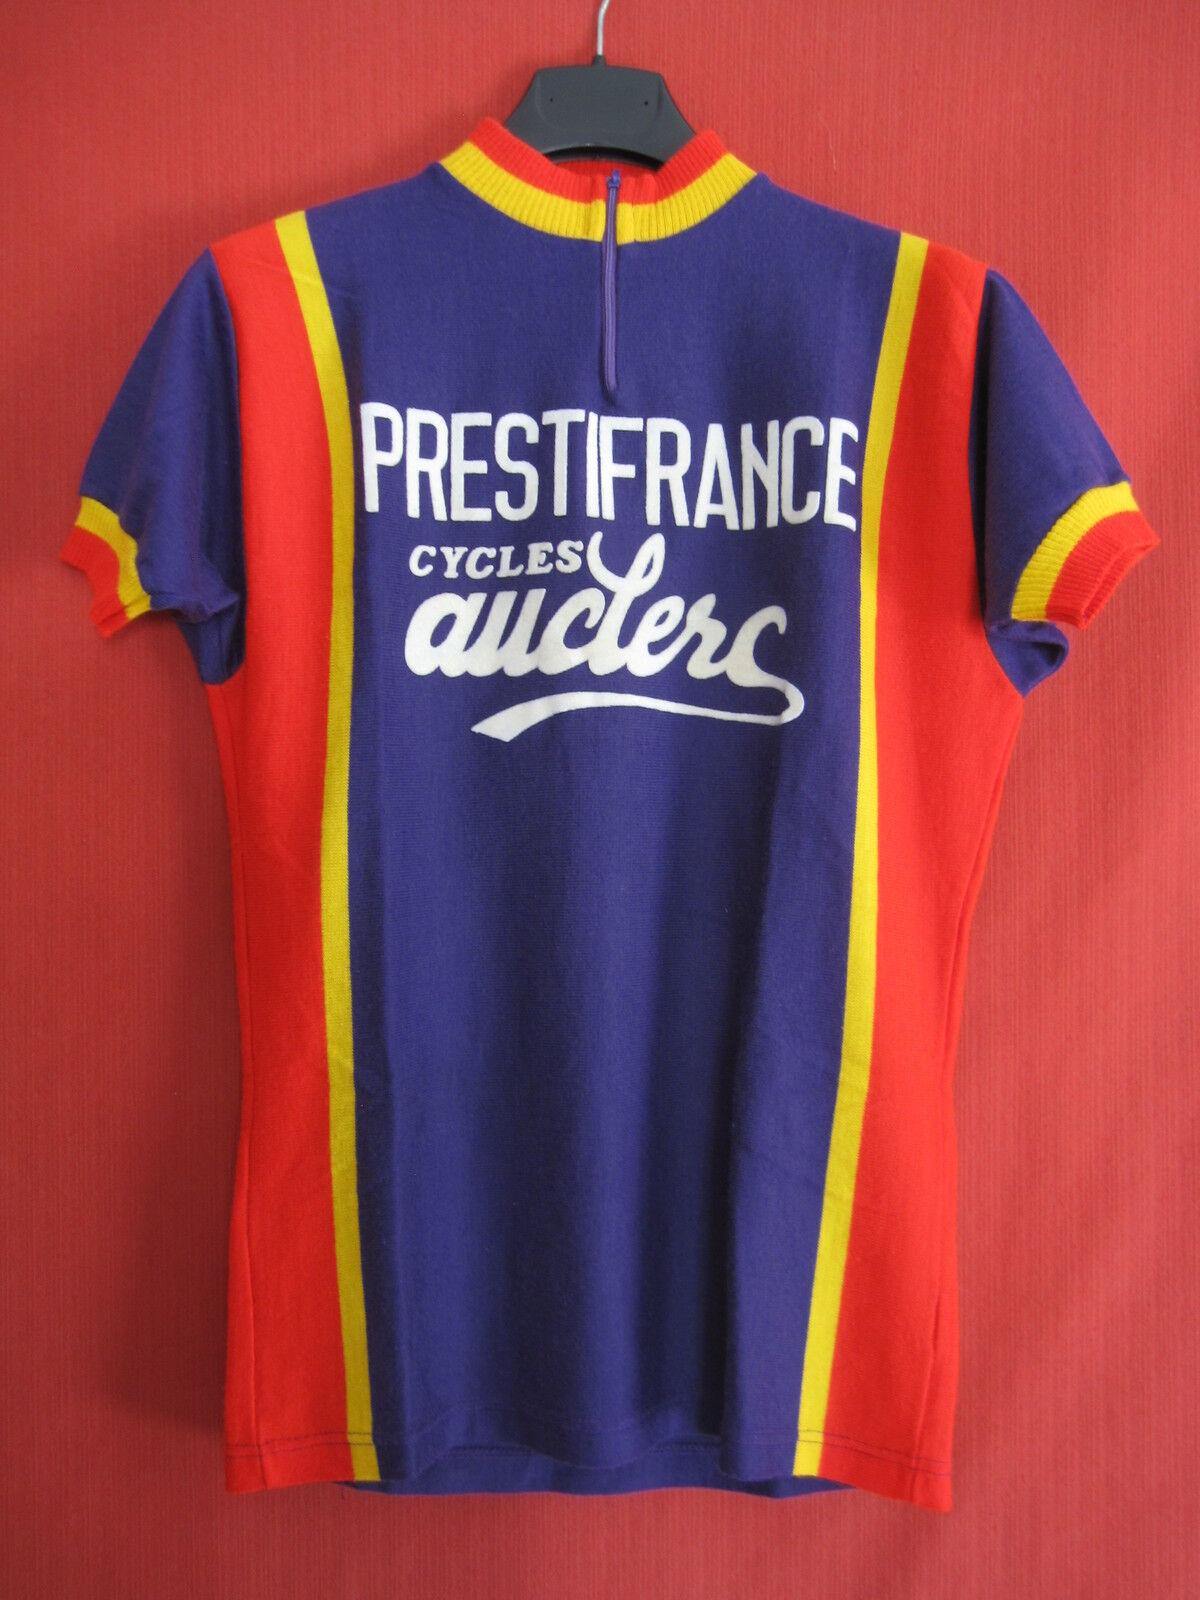 Maillot cycliste Vintage Prestifrance Cycles Auclerc 70'S Acrylique jersey - M